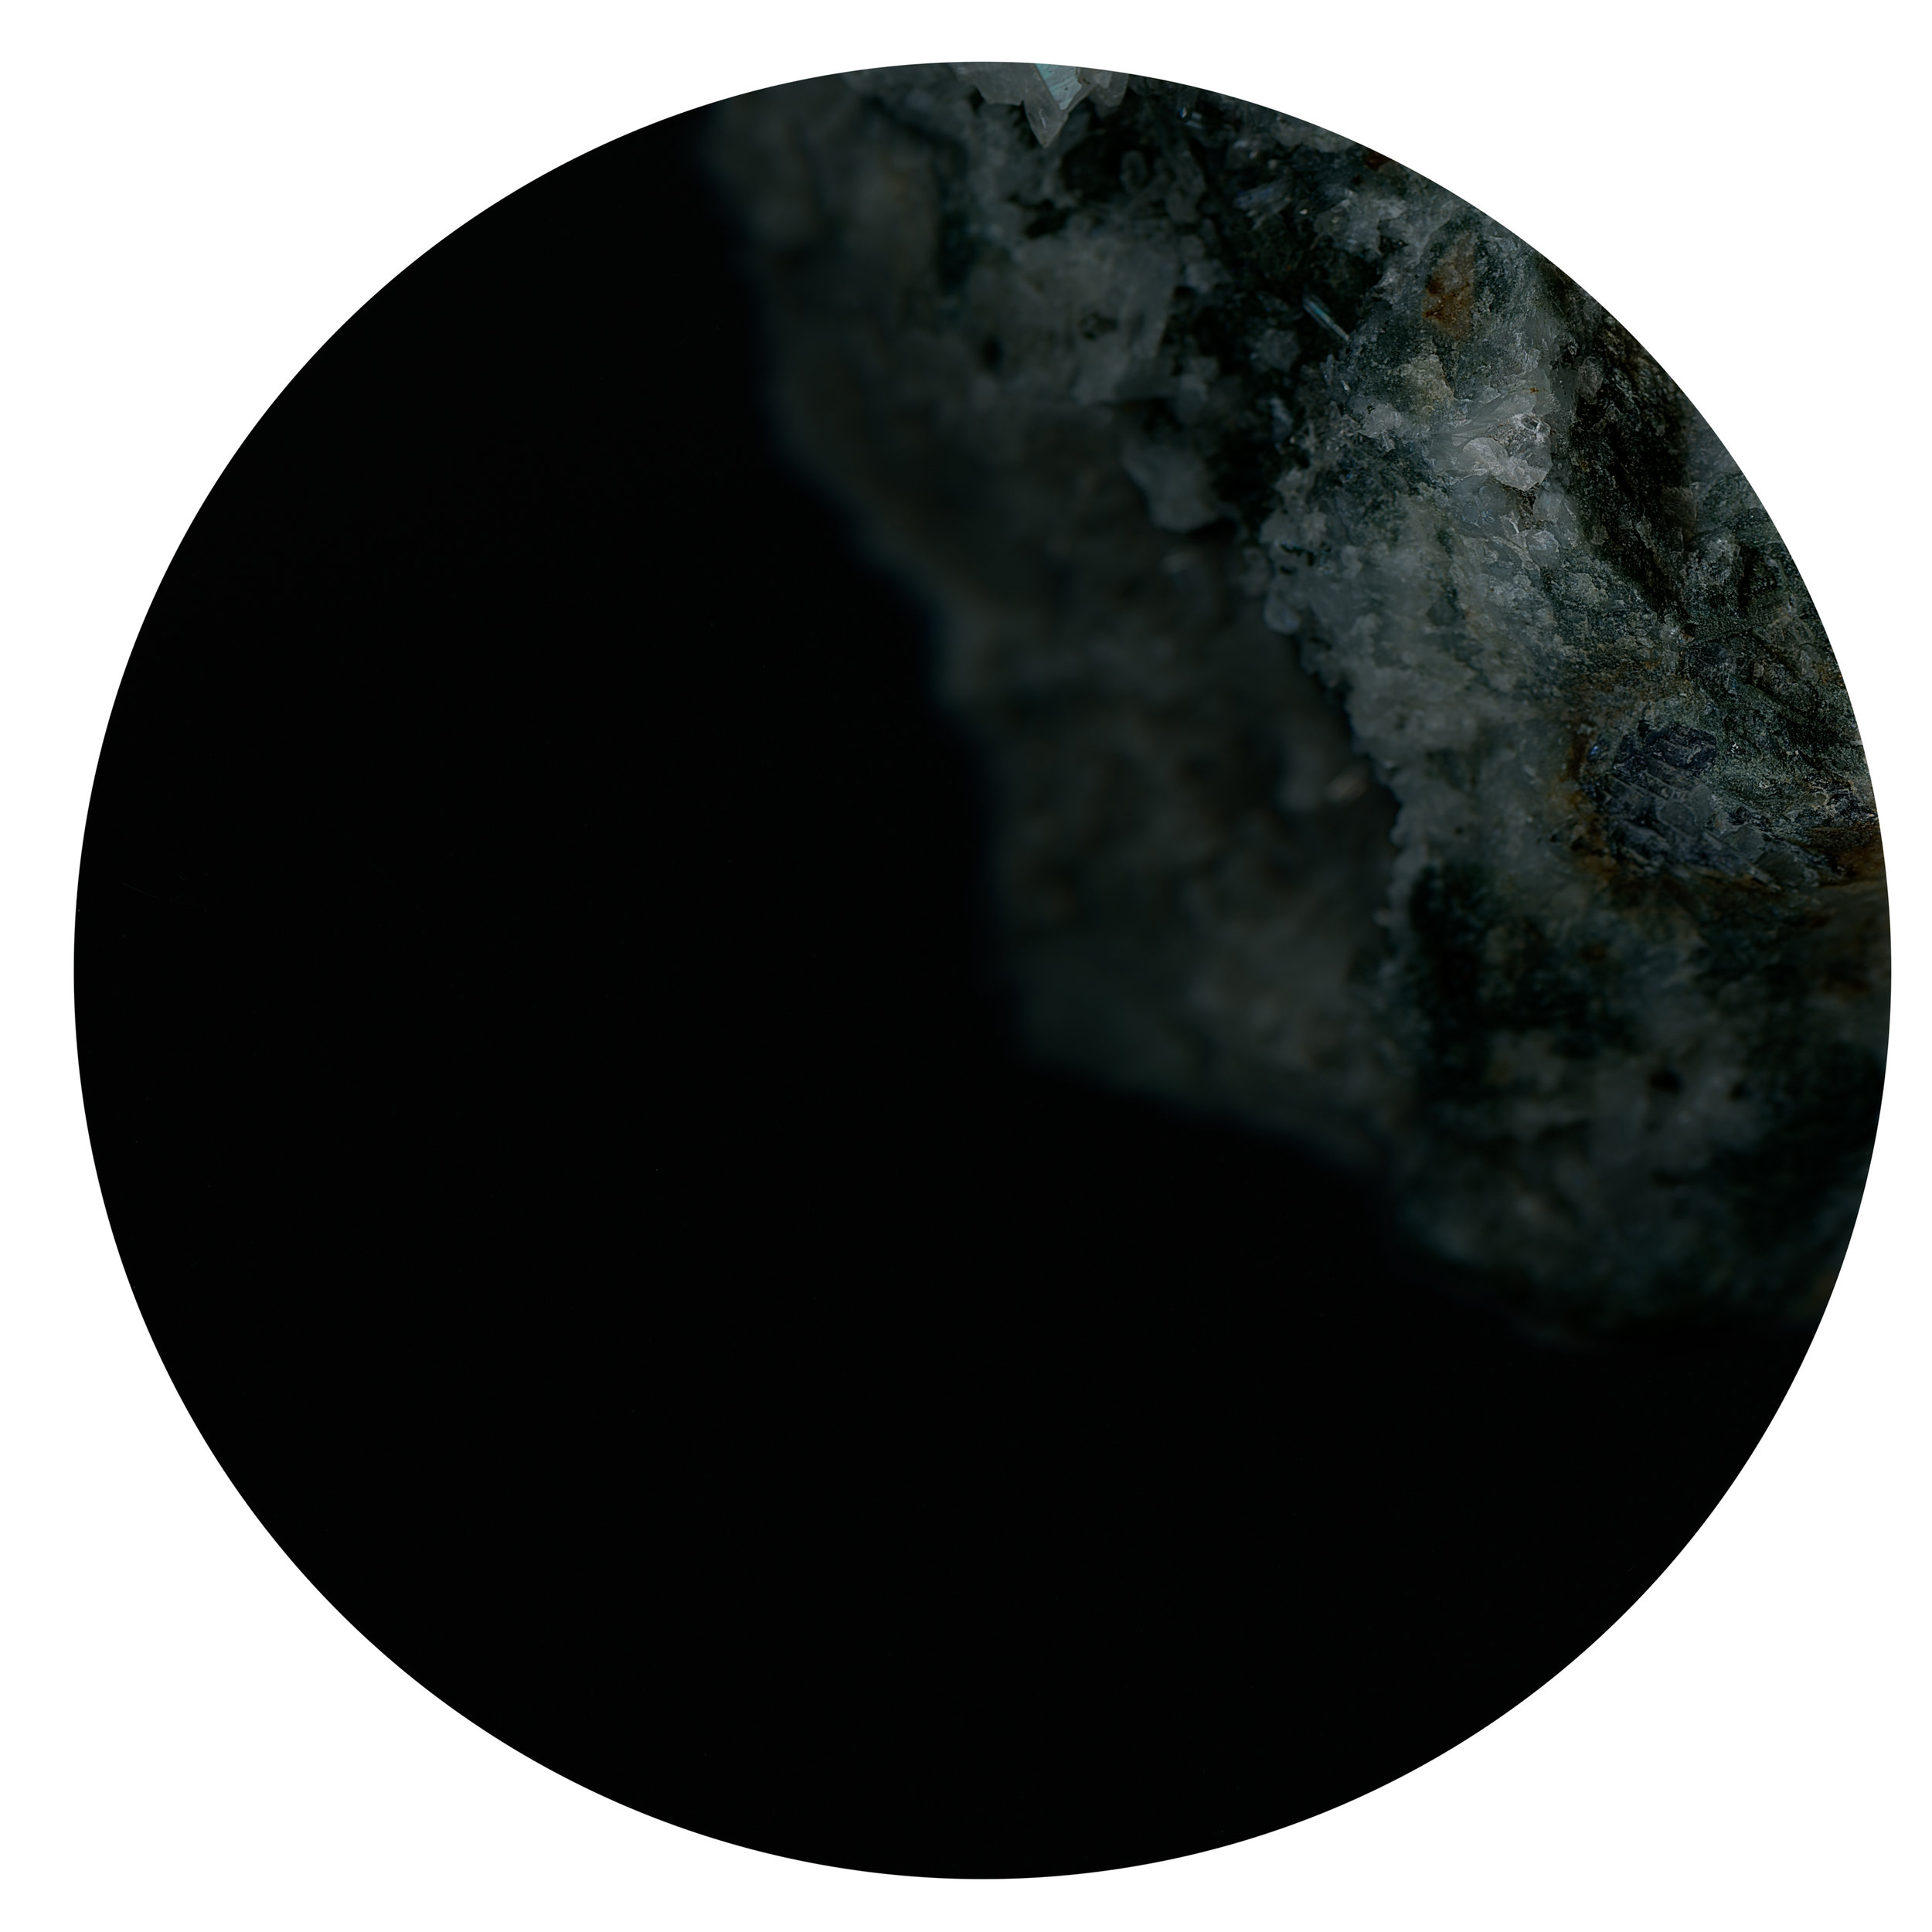 2_Planet X_2.jpg